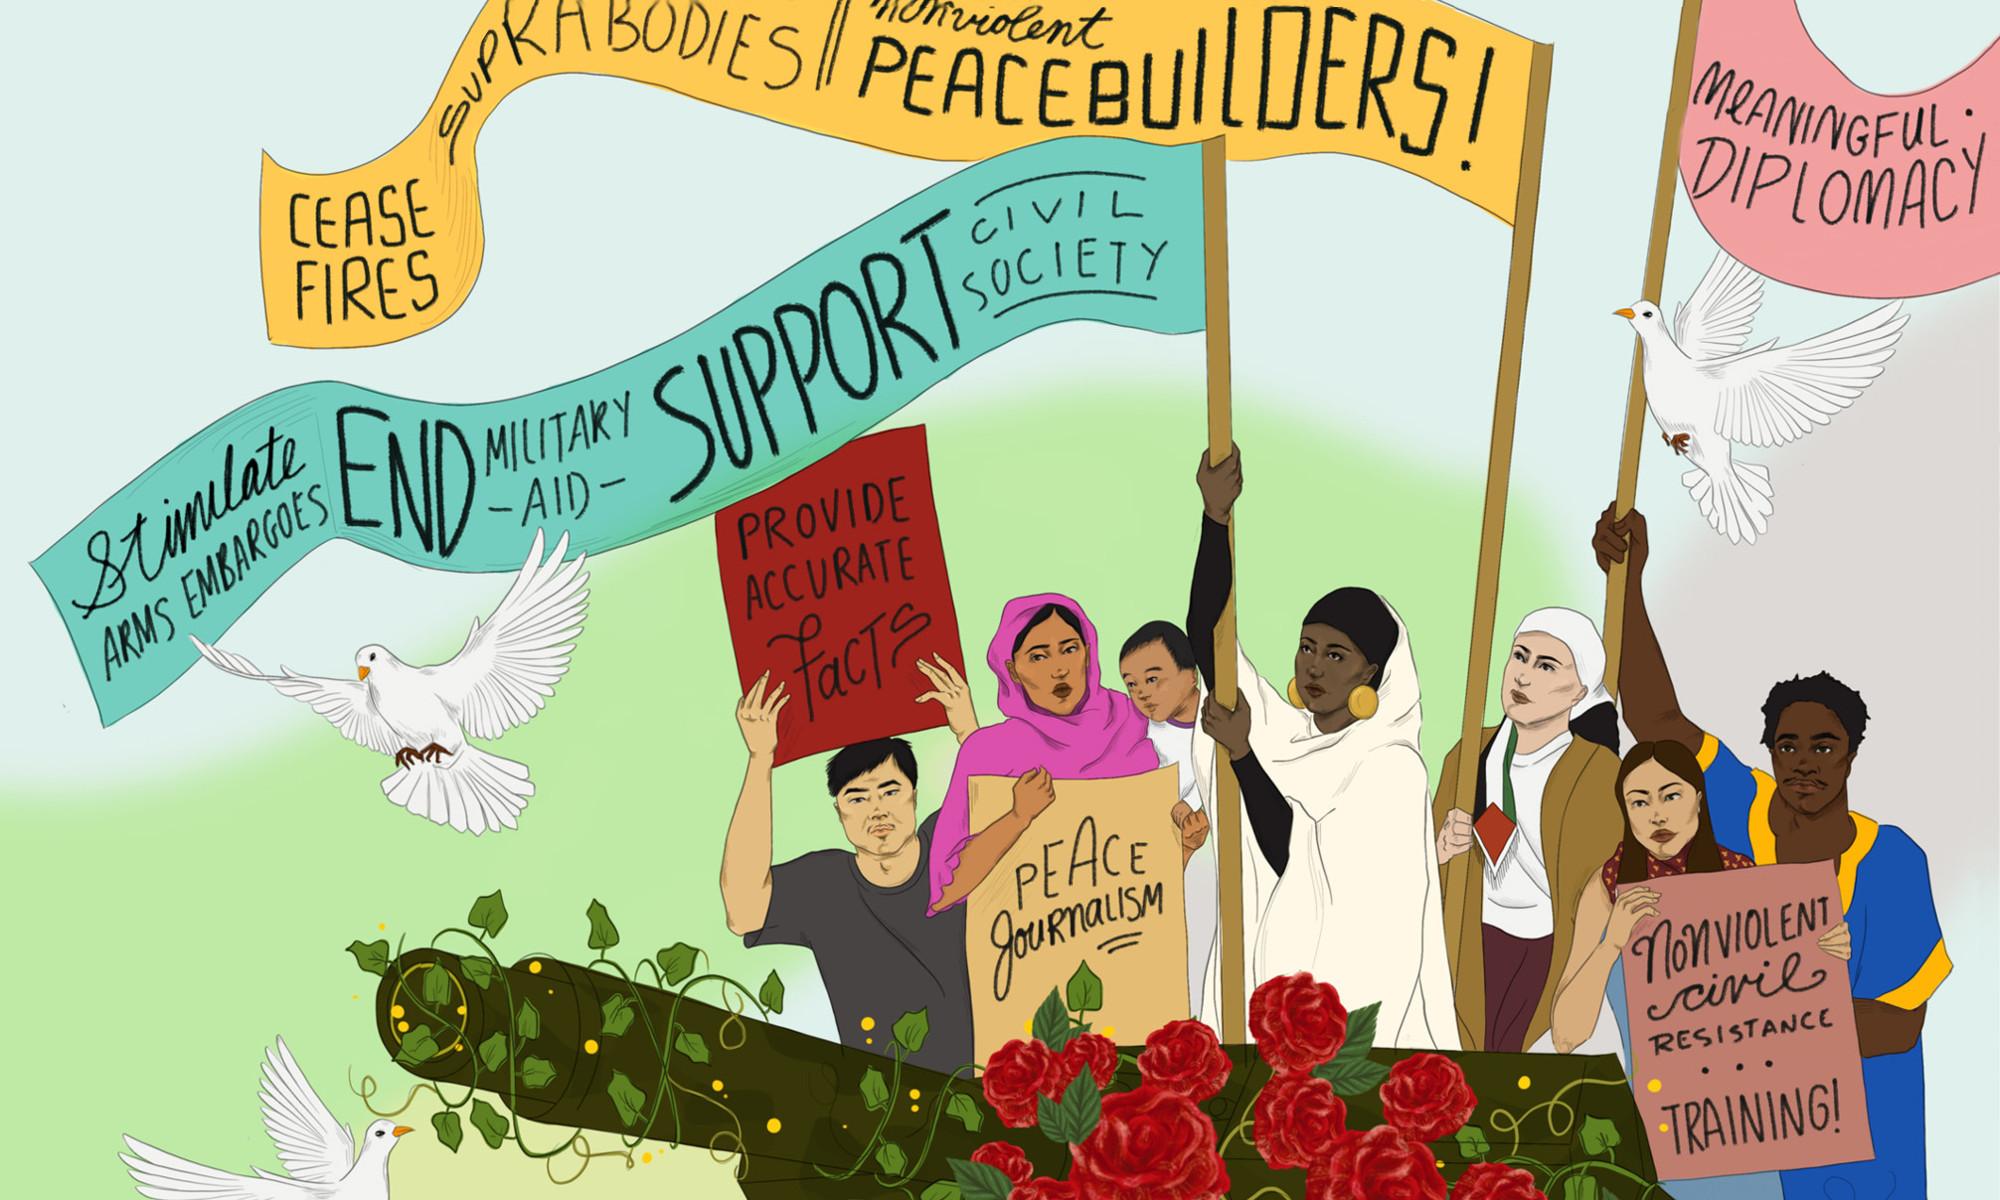 # NoWar2021: désinvestir, désarmer, démilitariser - 1-6 juin 2021 - Ottawa